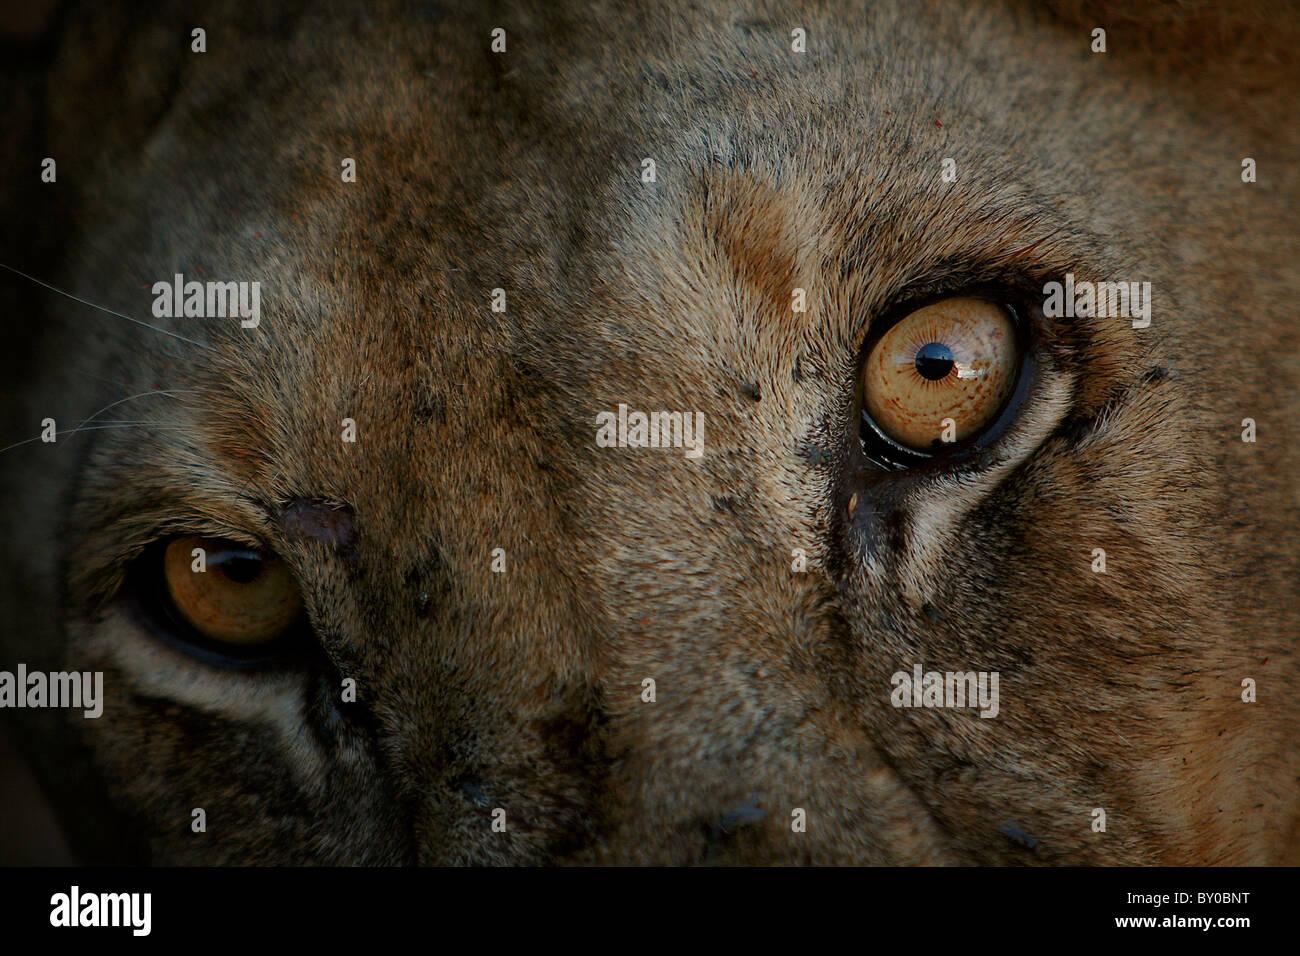 FEMALE LION (PANTHERA LEO) MIKUMI NATIONAL PARK TANZANIA AFRICA. - Stock Image